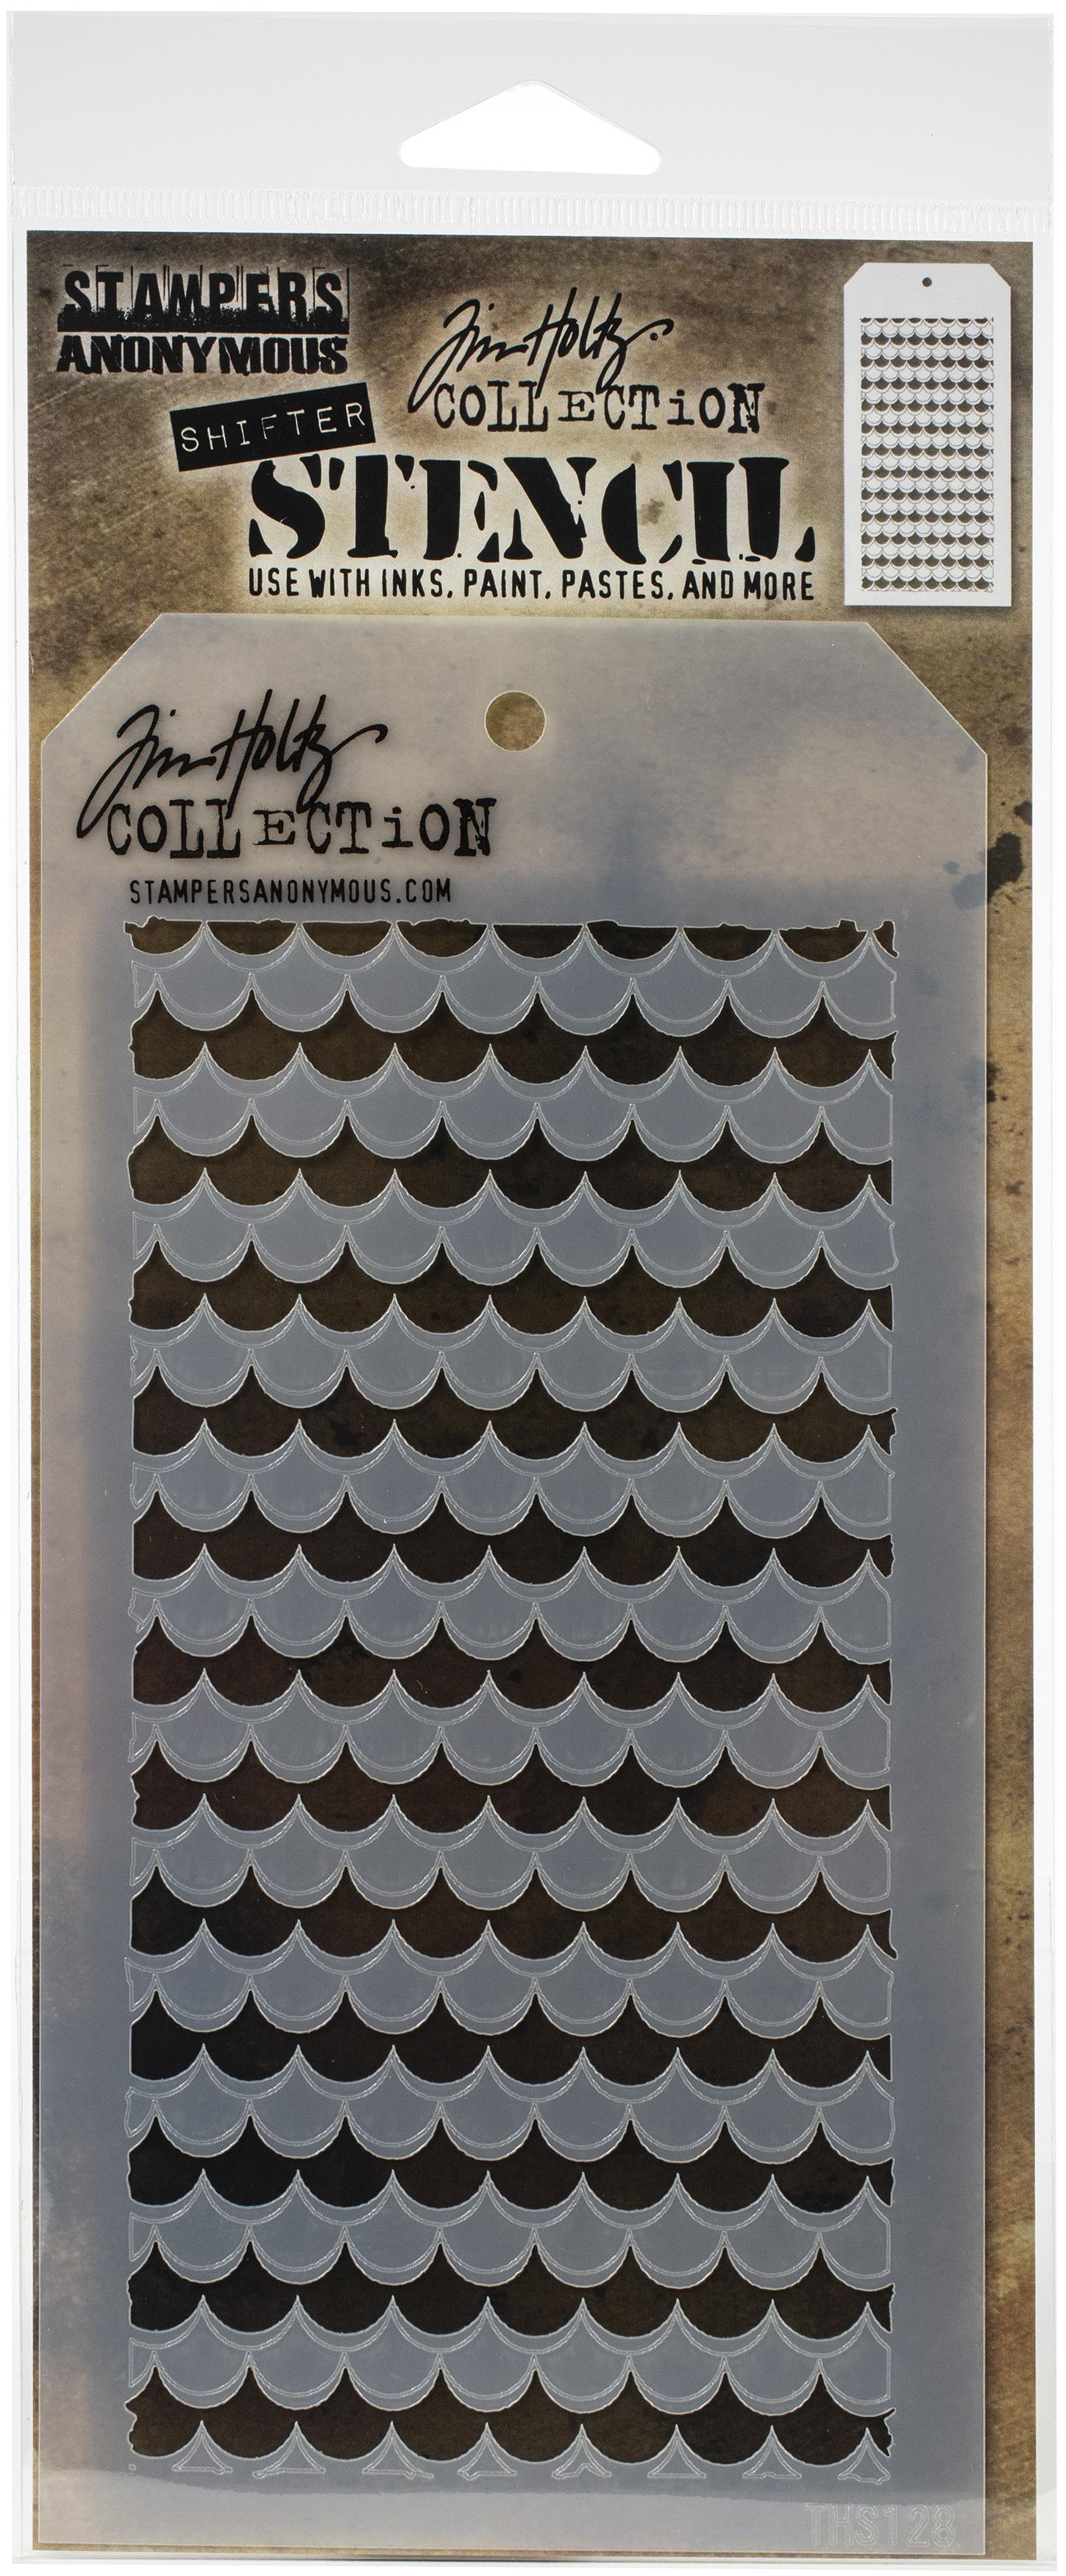 Tim Holtz Layered Stencil 4.125X8.5-Shifter Scallop